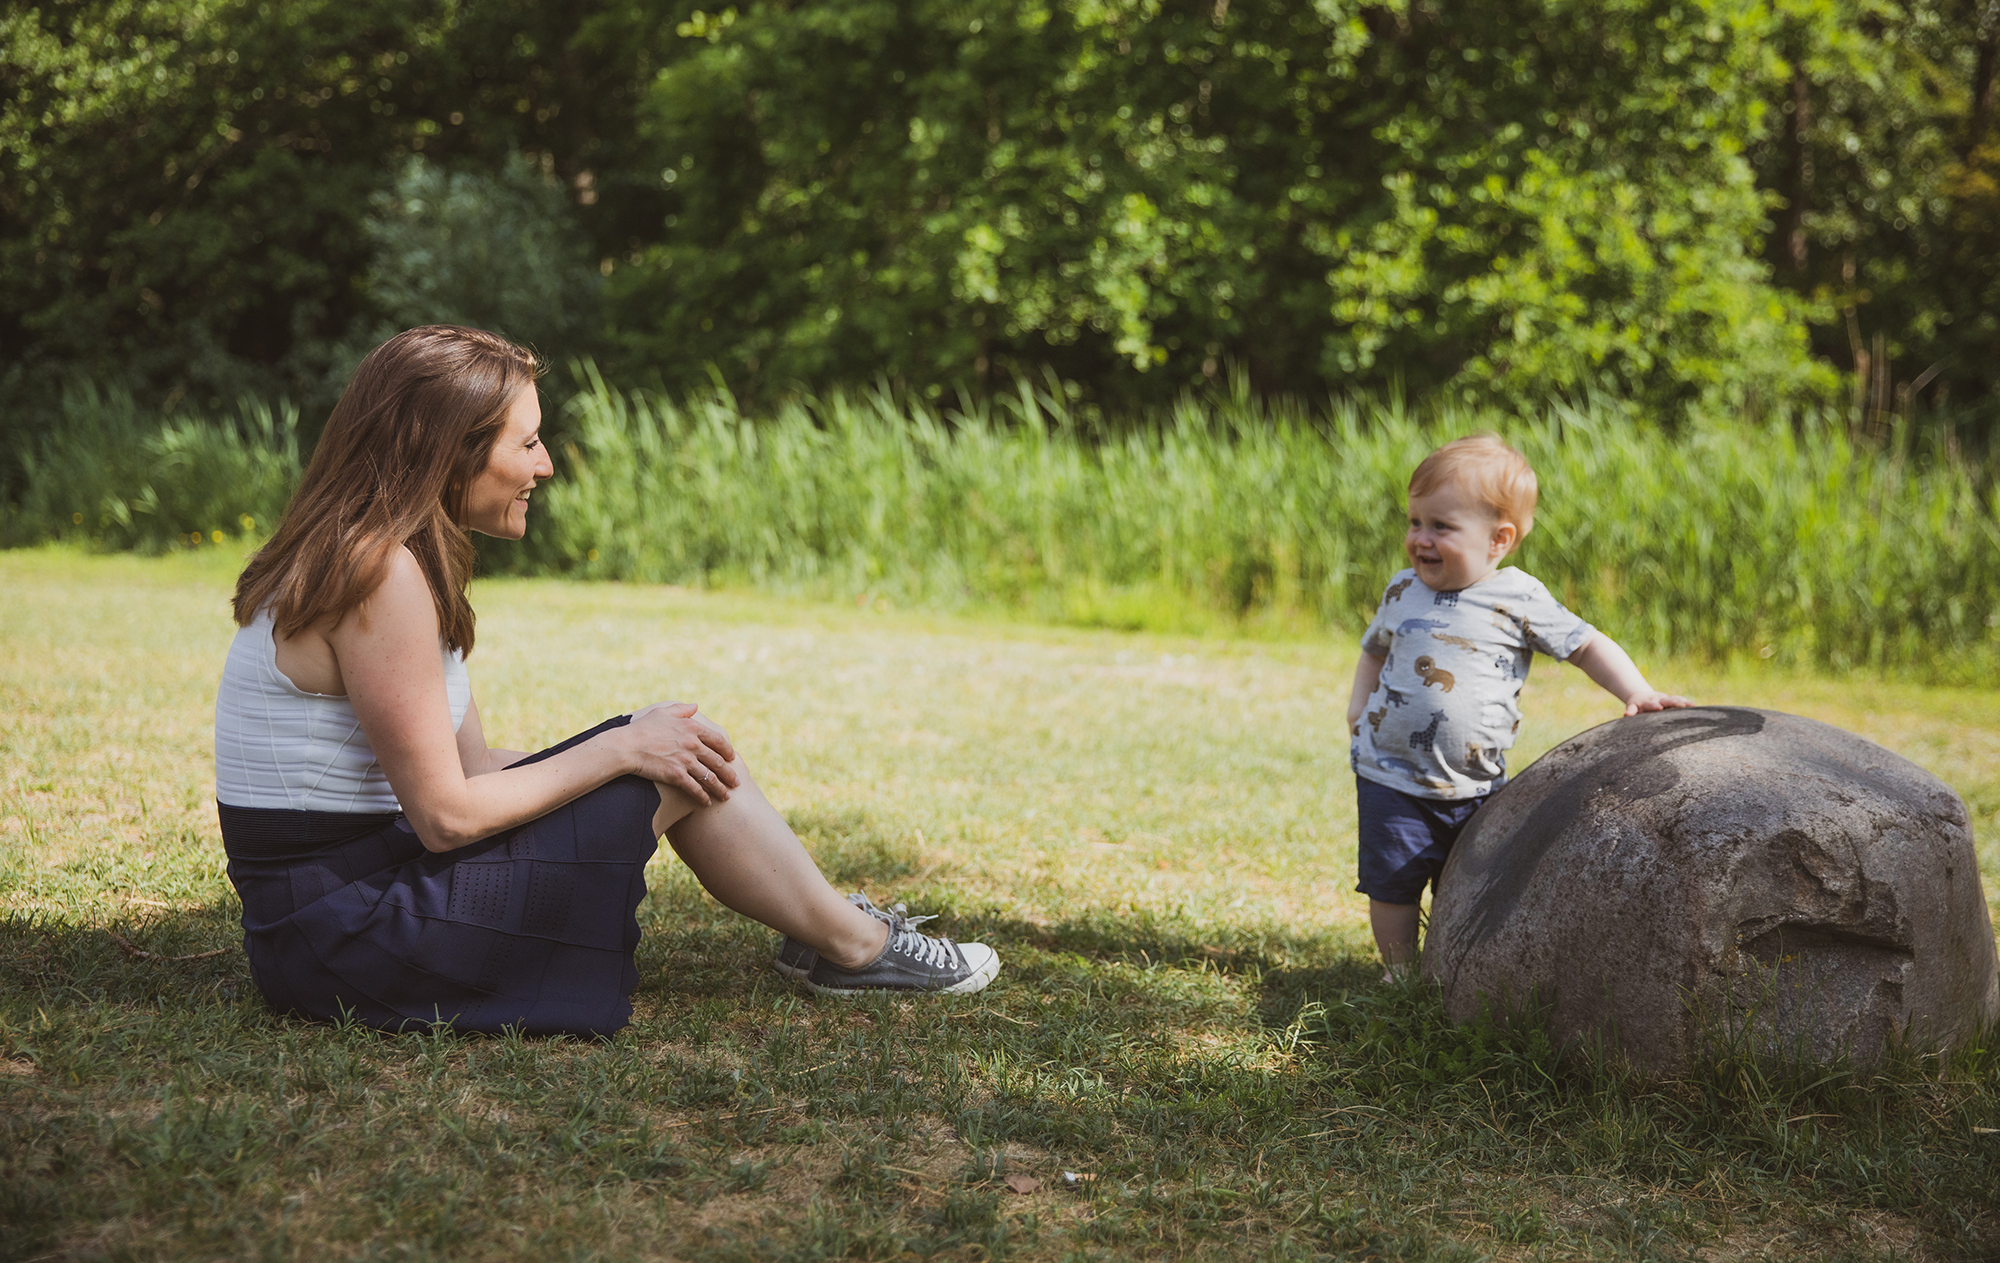 Gezinsfoto, gezinsfotografie of gezinsreportage, moeder en zoon fotografie